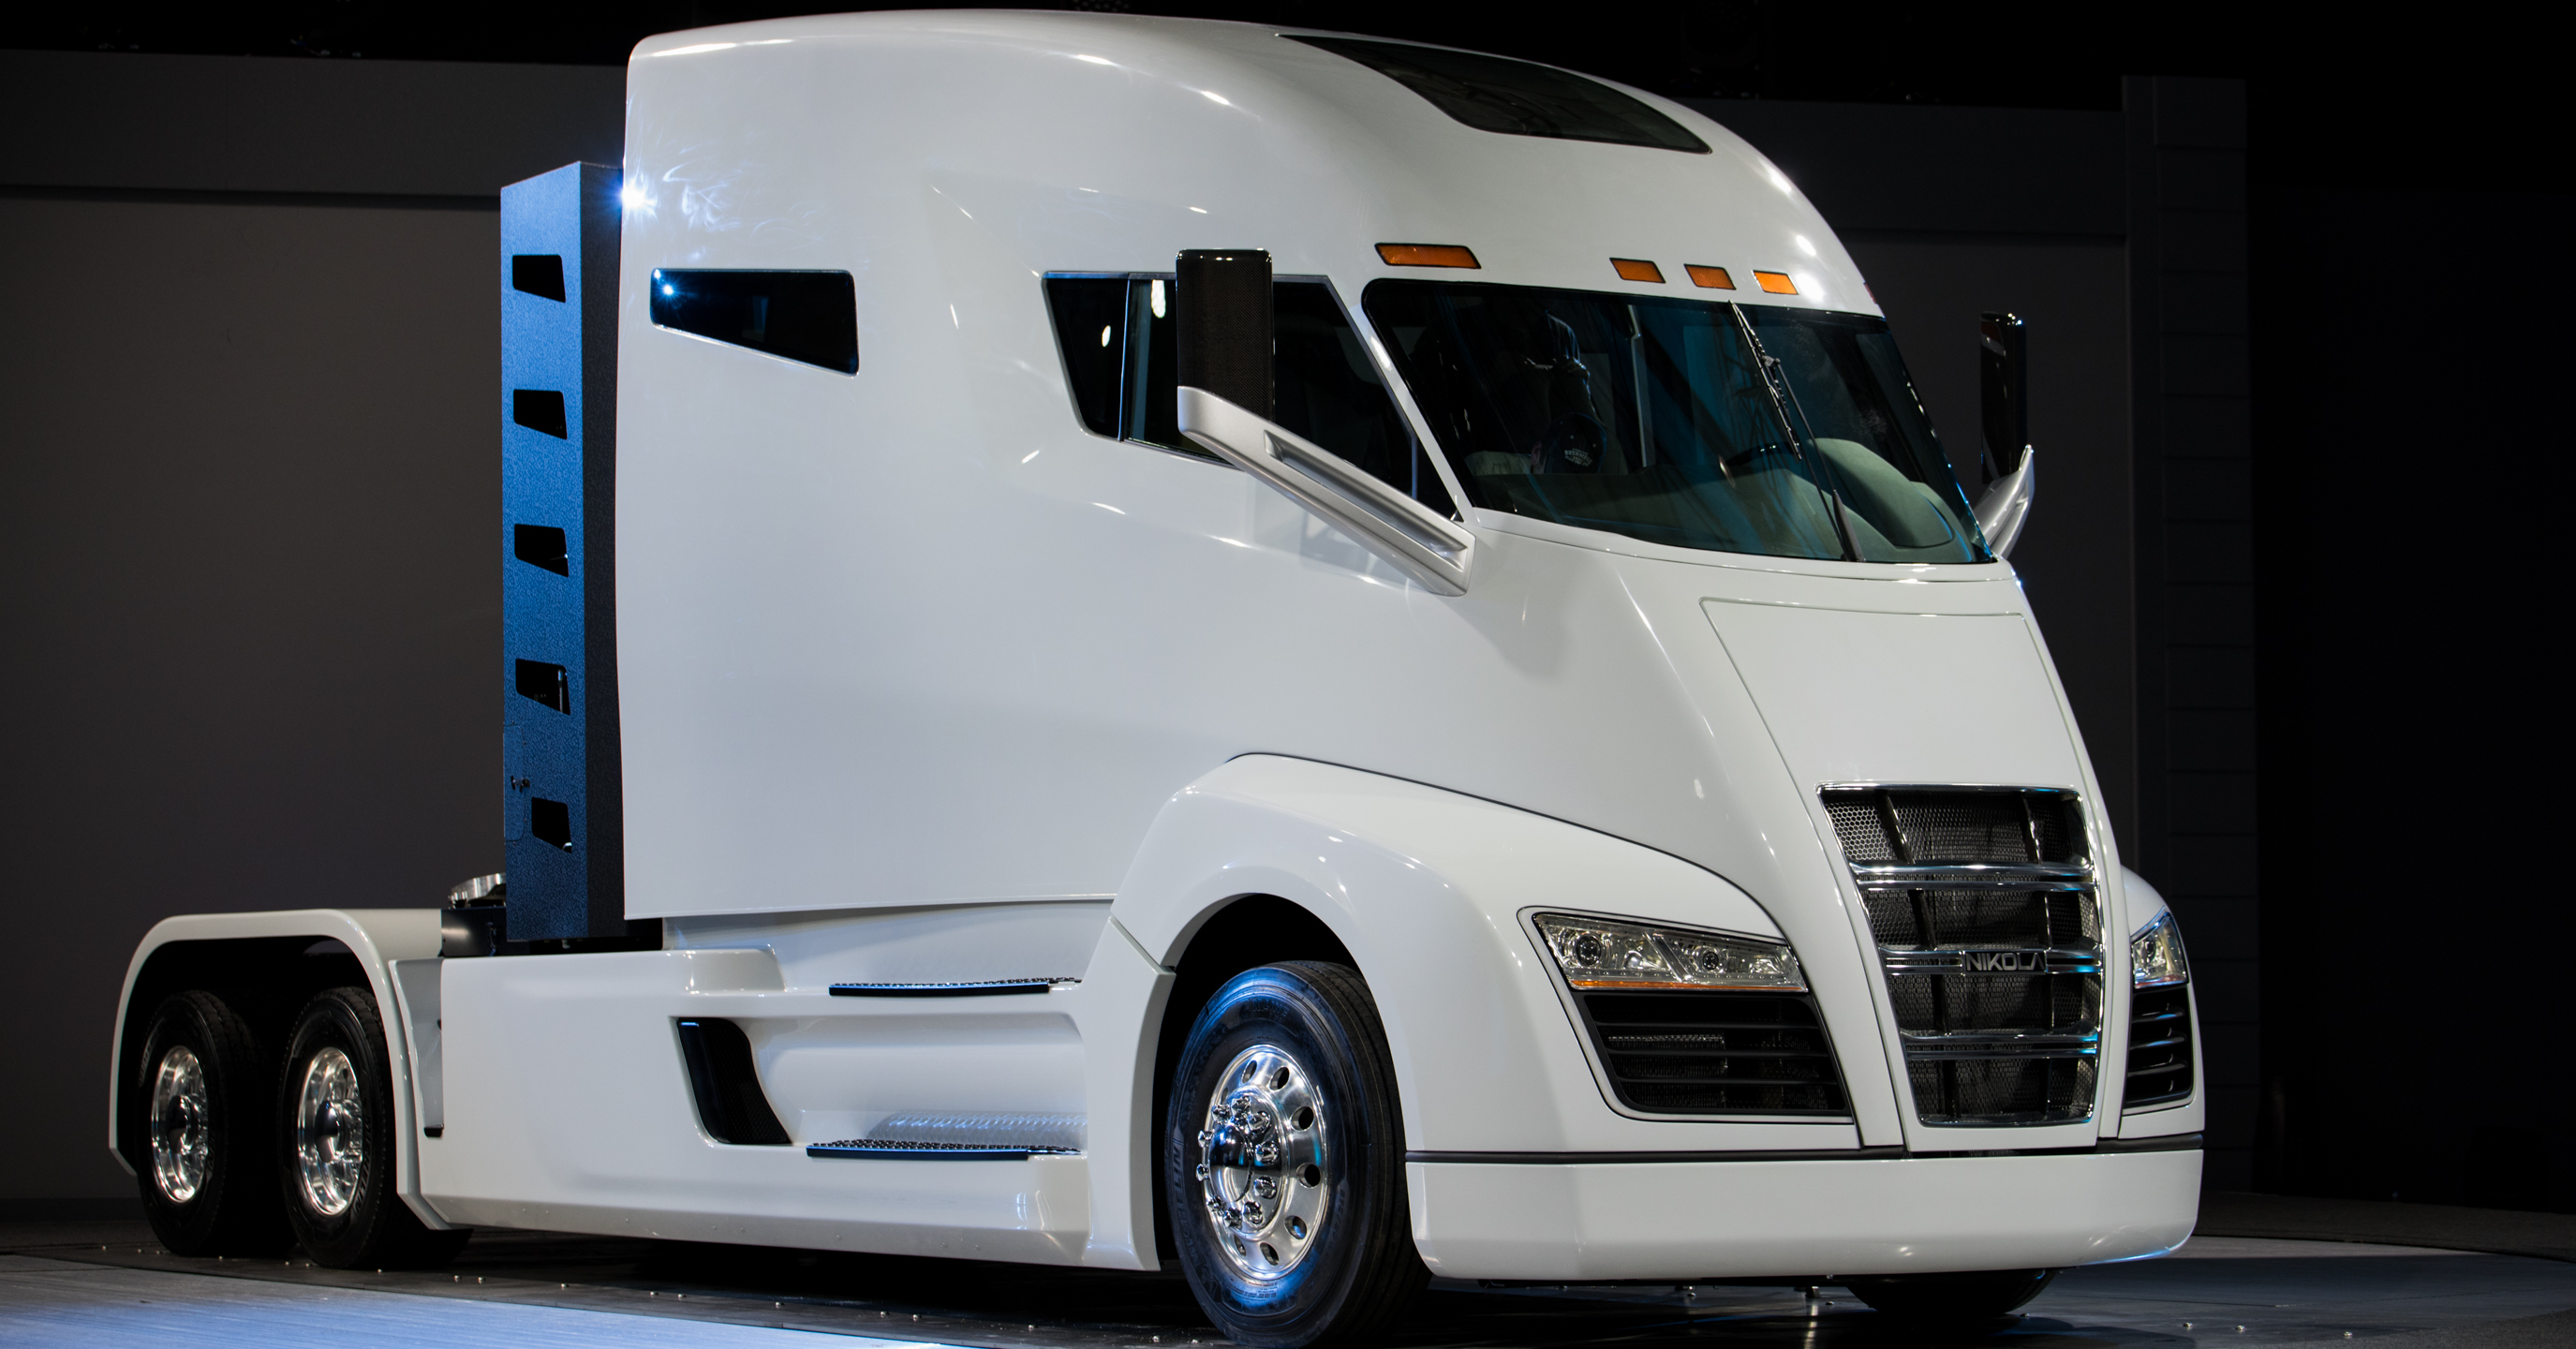 Nikola Introduces Its Electric Truck  The Nikola One